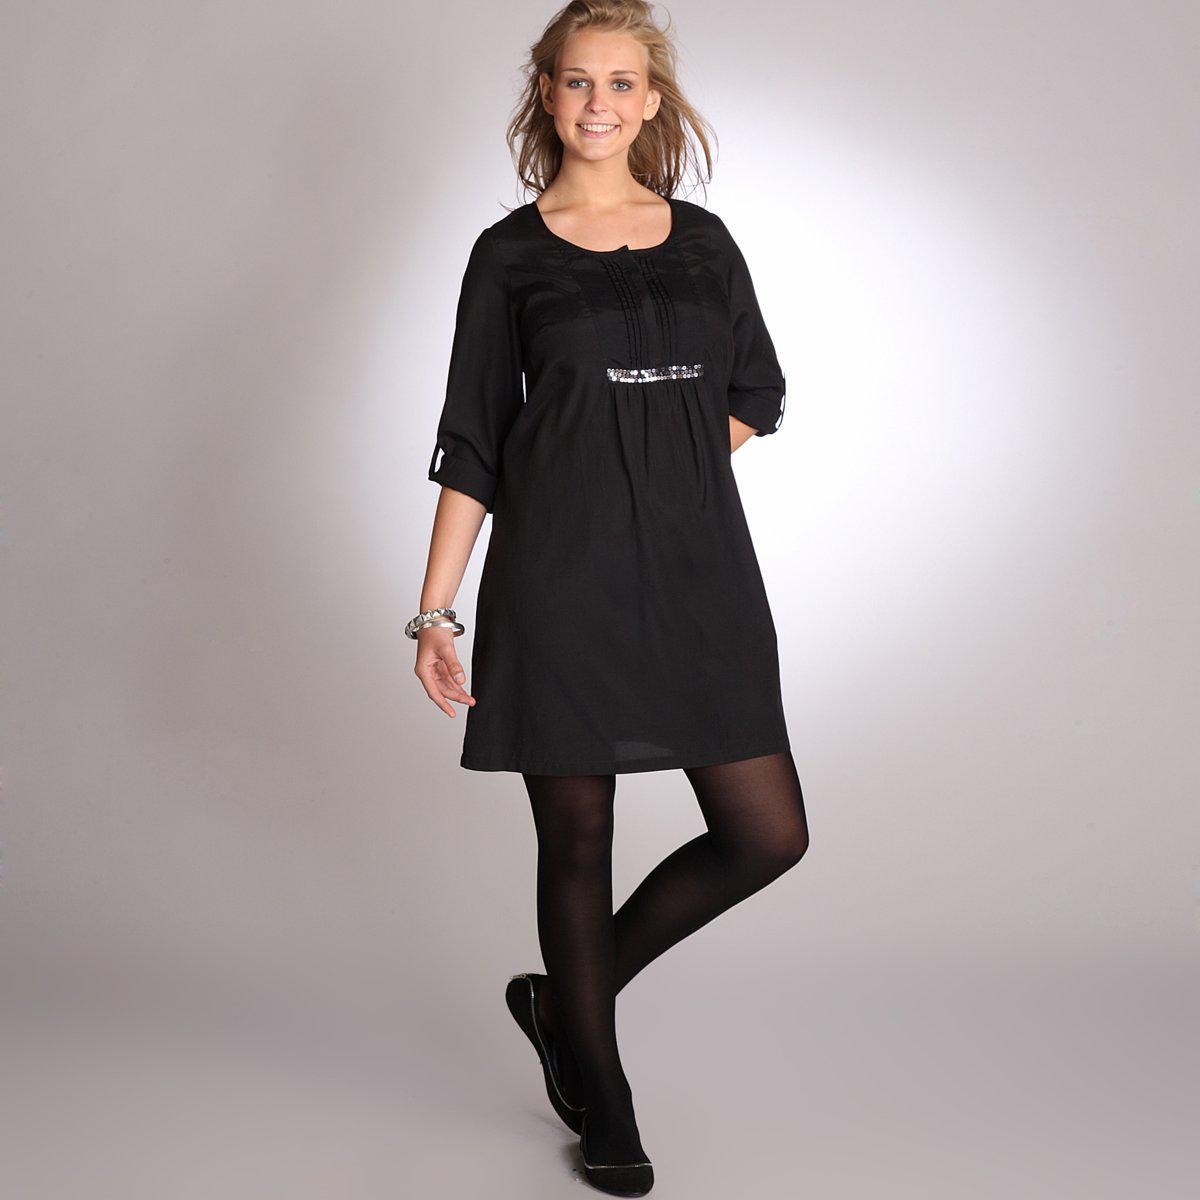 bradyna foremata 222 - Βραδυνα Φορεματα LaRedoute Φθινόπωρο 2011 Κωδ. 324181203